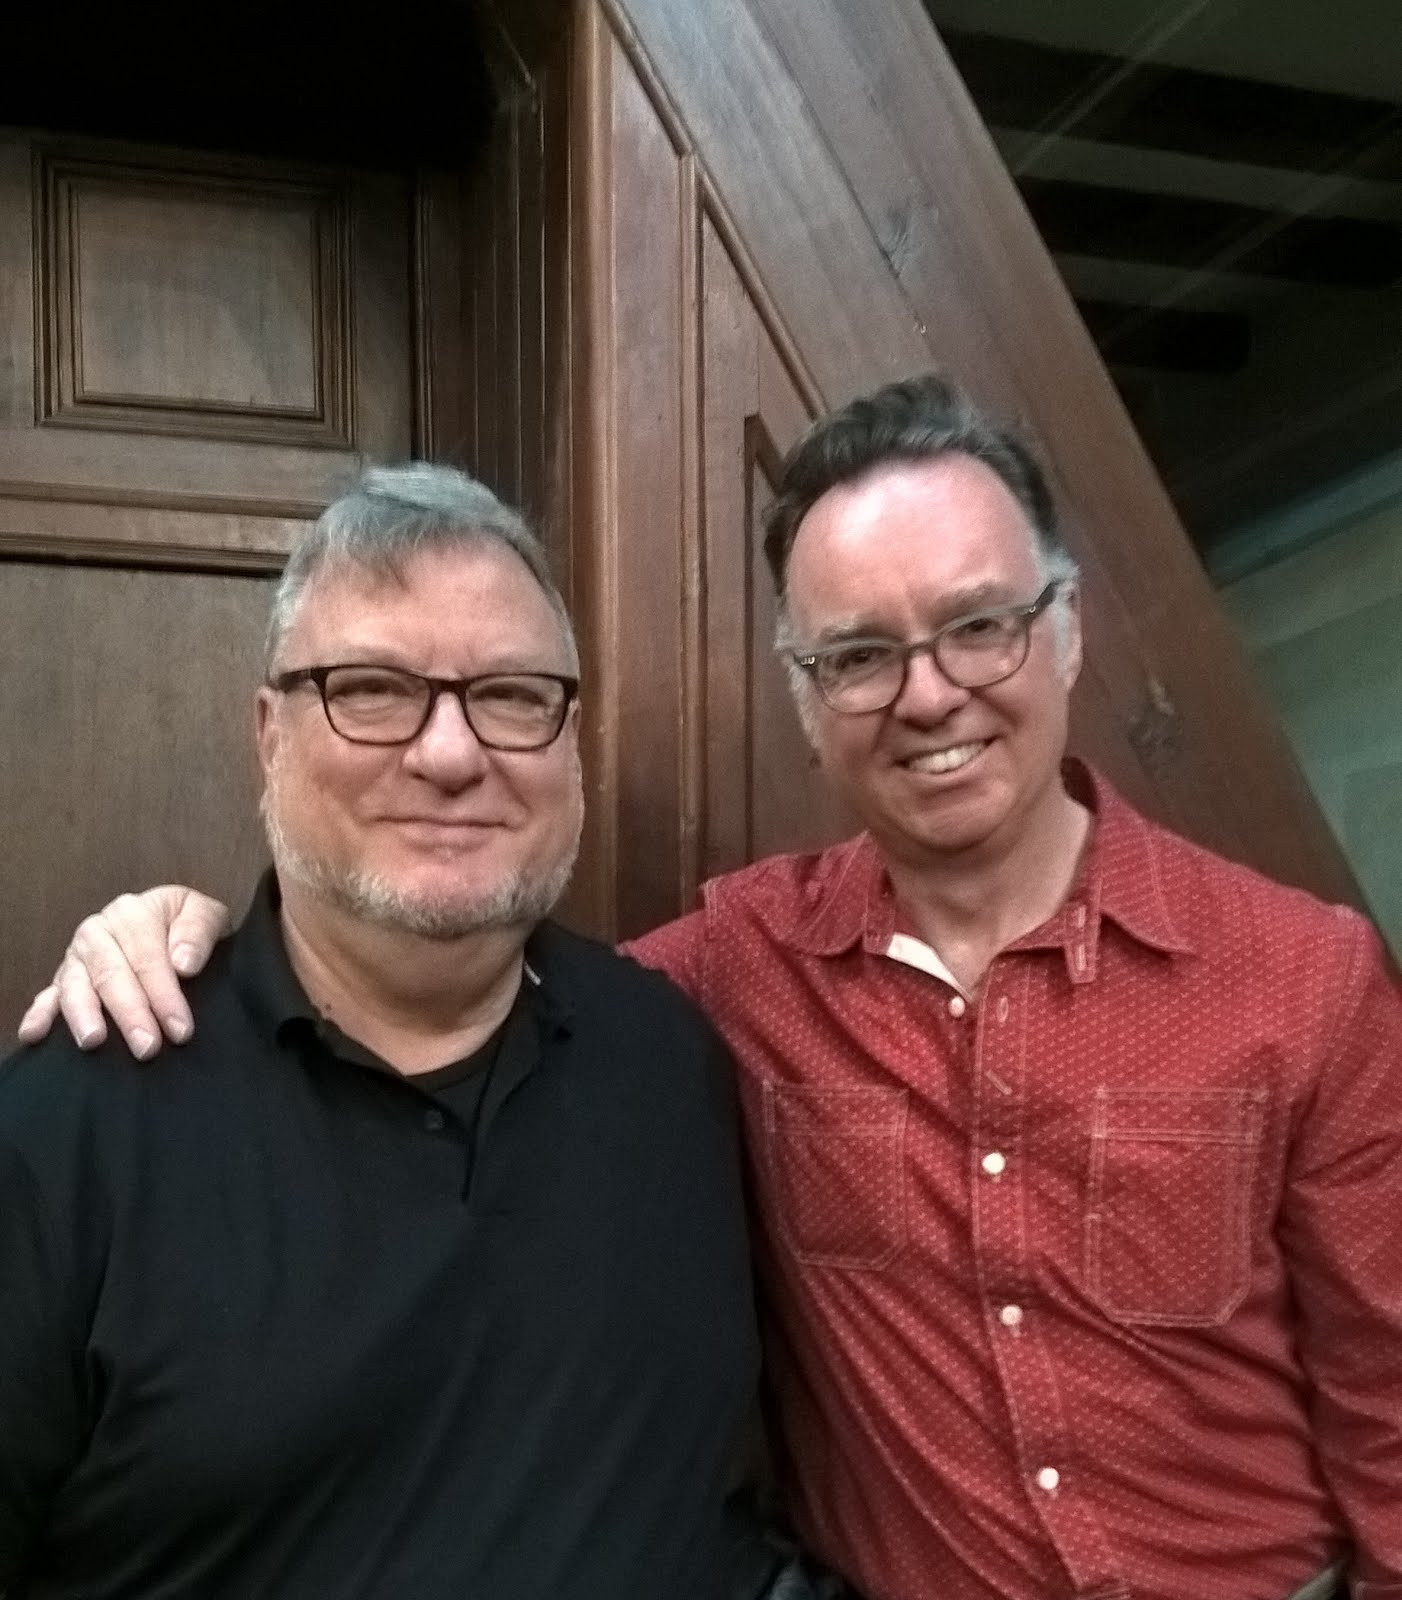 With  Mr. CARL SONNY LEYLAND